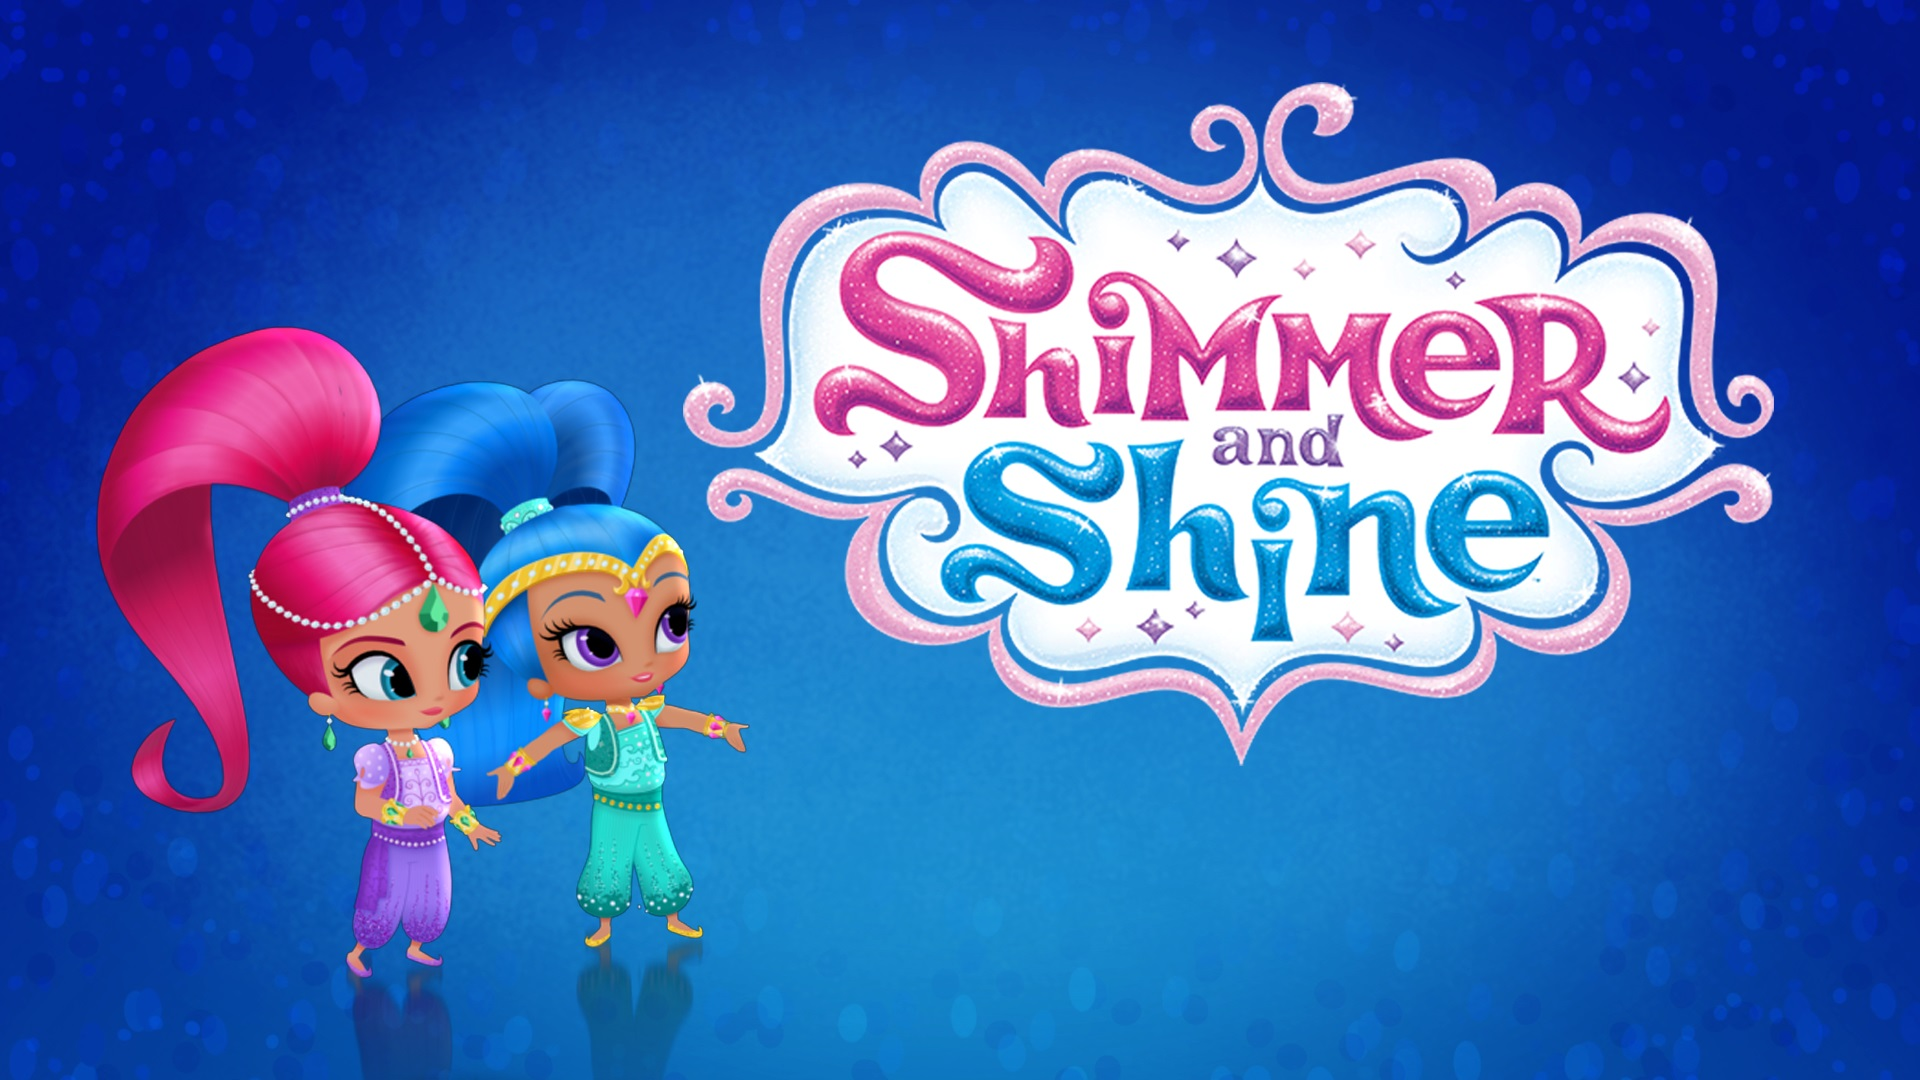 Shimmer And Shine Shimmer And Shine Wallpaper 42637372